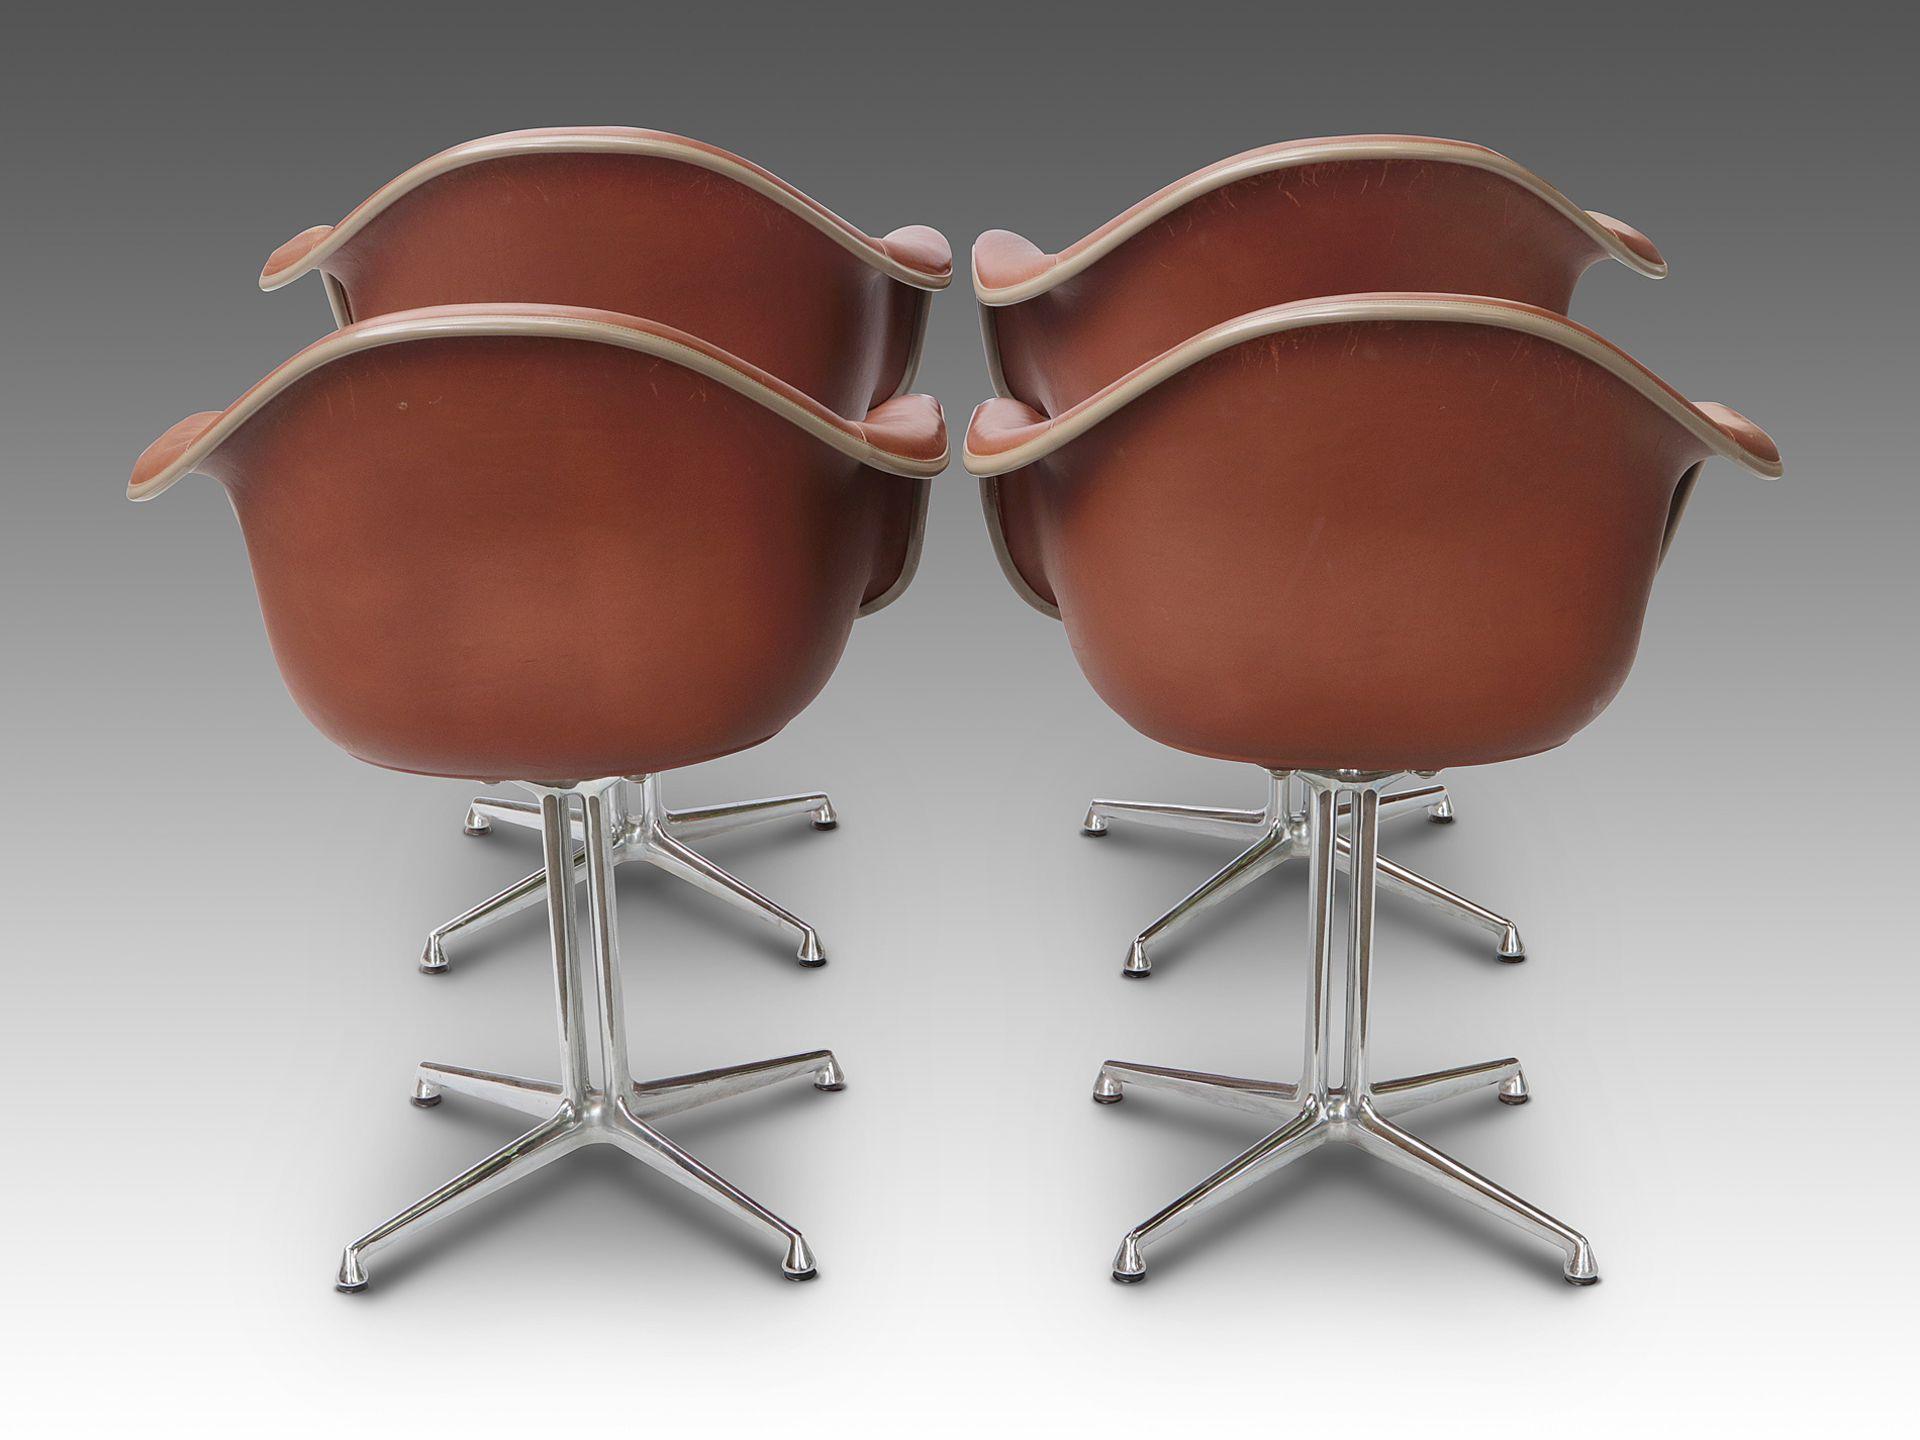 Eames-Schalensessel - 8er Satz - Image 3 of 9